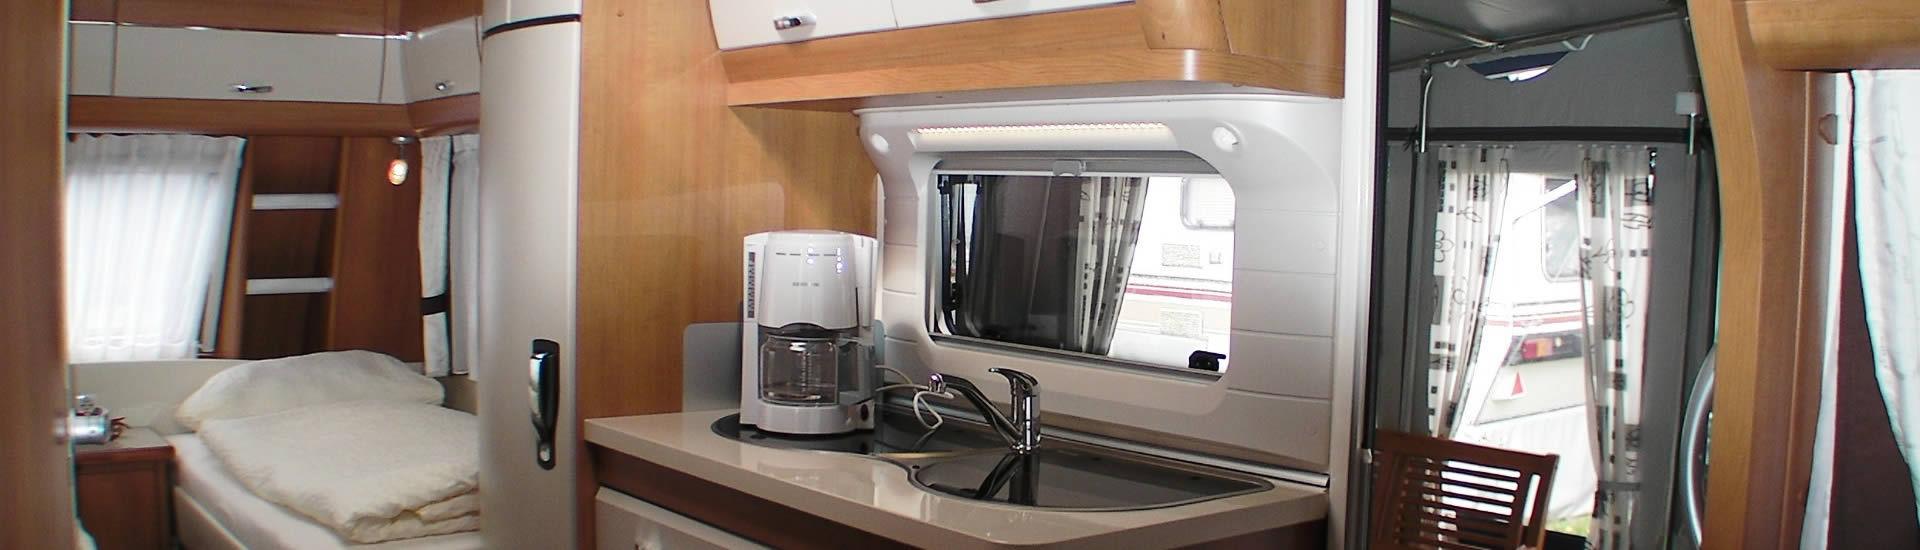 Mietwohnwagen Seerose Bild 2